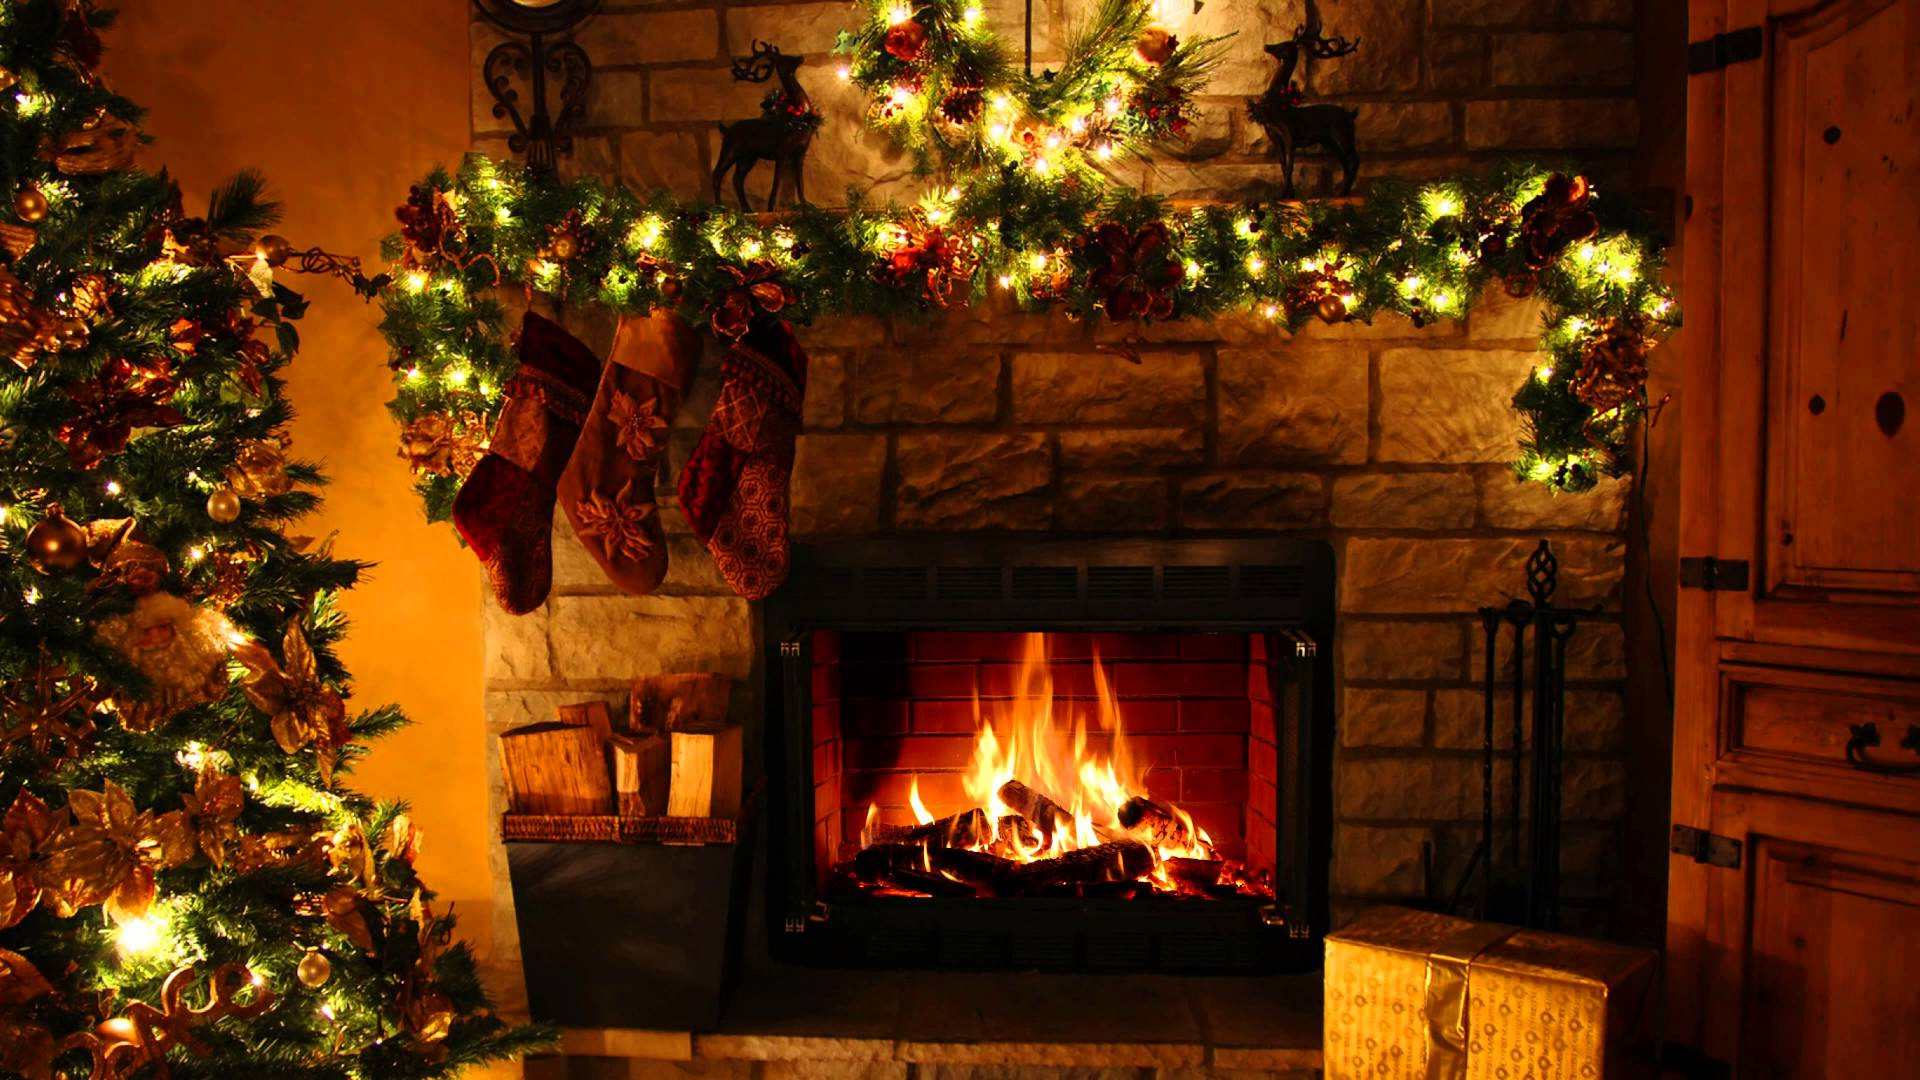 Free Christmas Fireplace Screensaver  decorating screensavers DriverLayer Search Engine